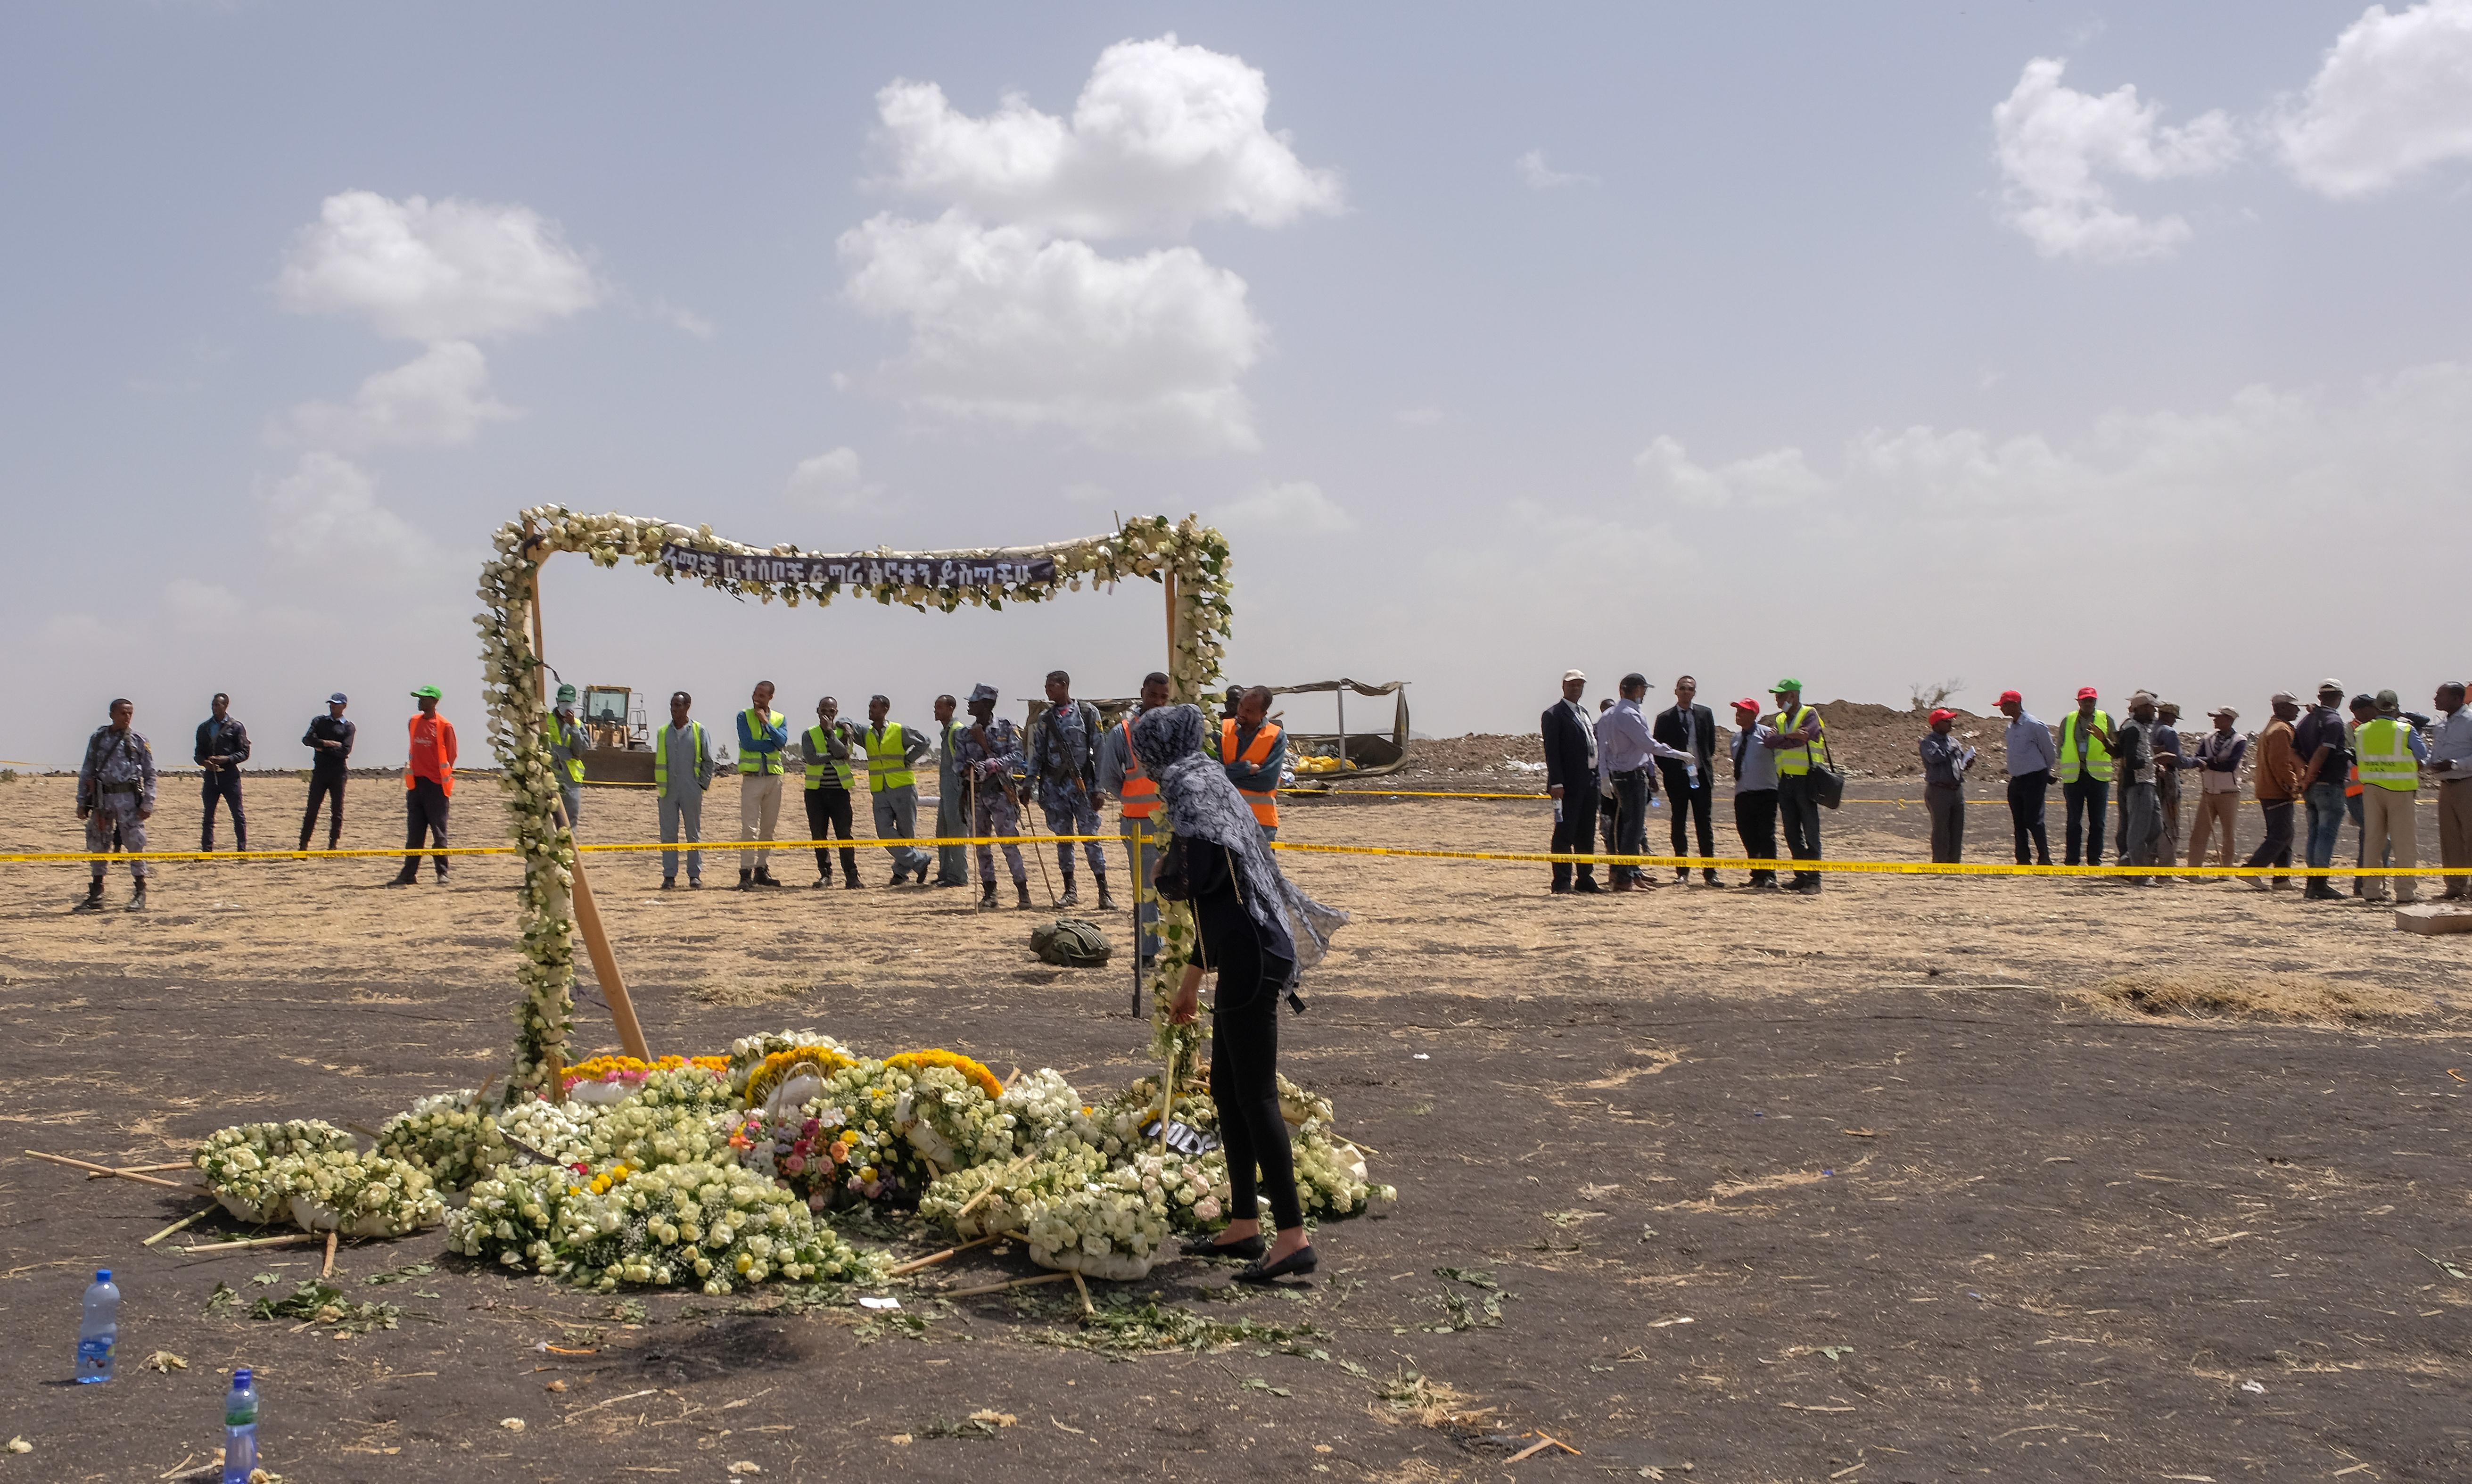 Boeing 737 Max: US prosecutors investigate plane after fatal crashes